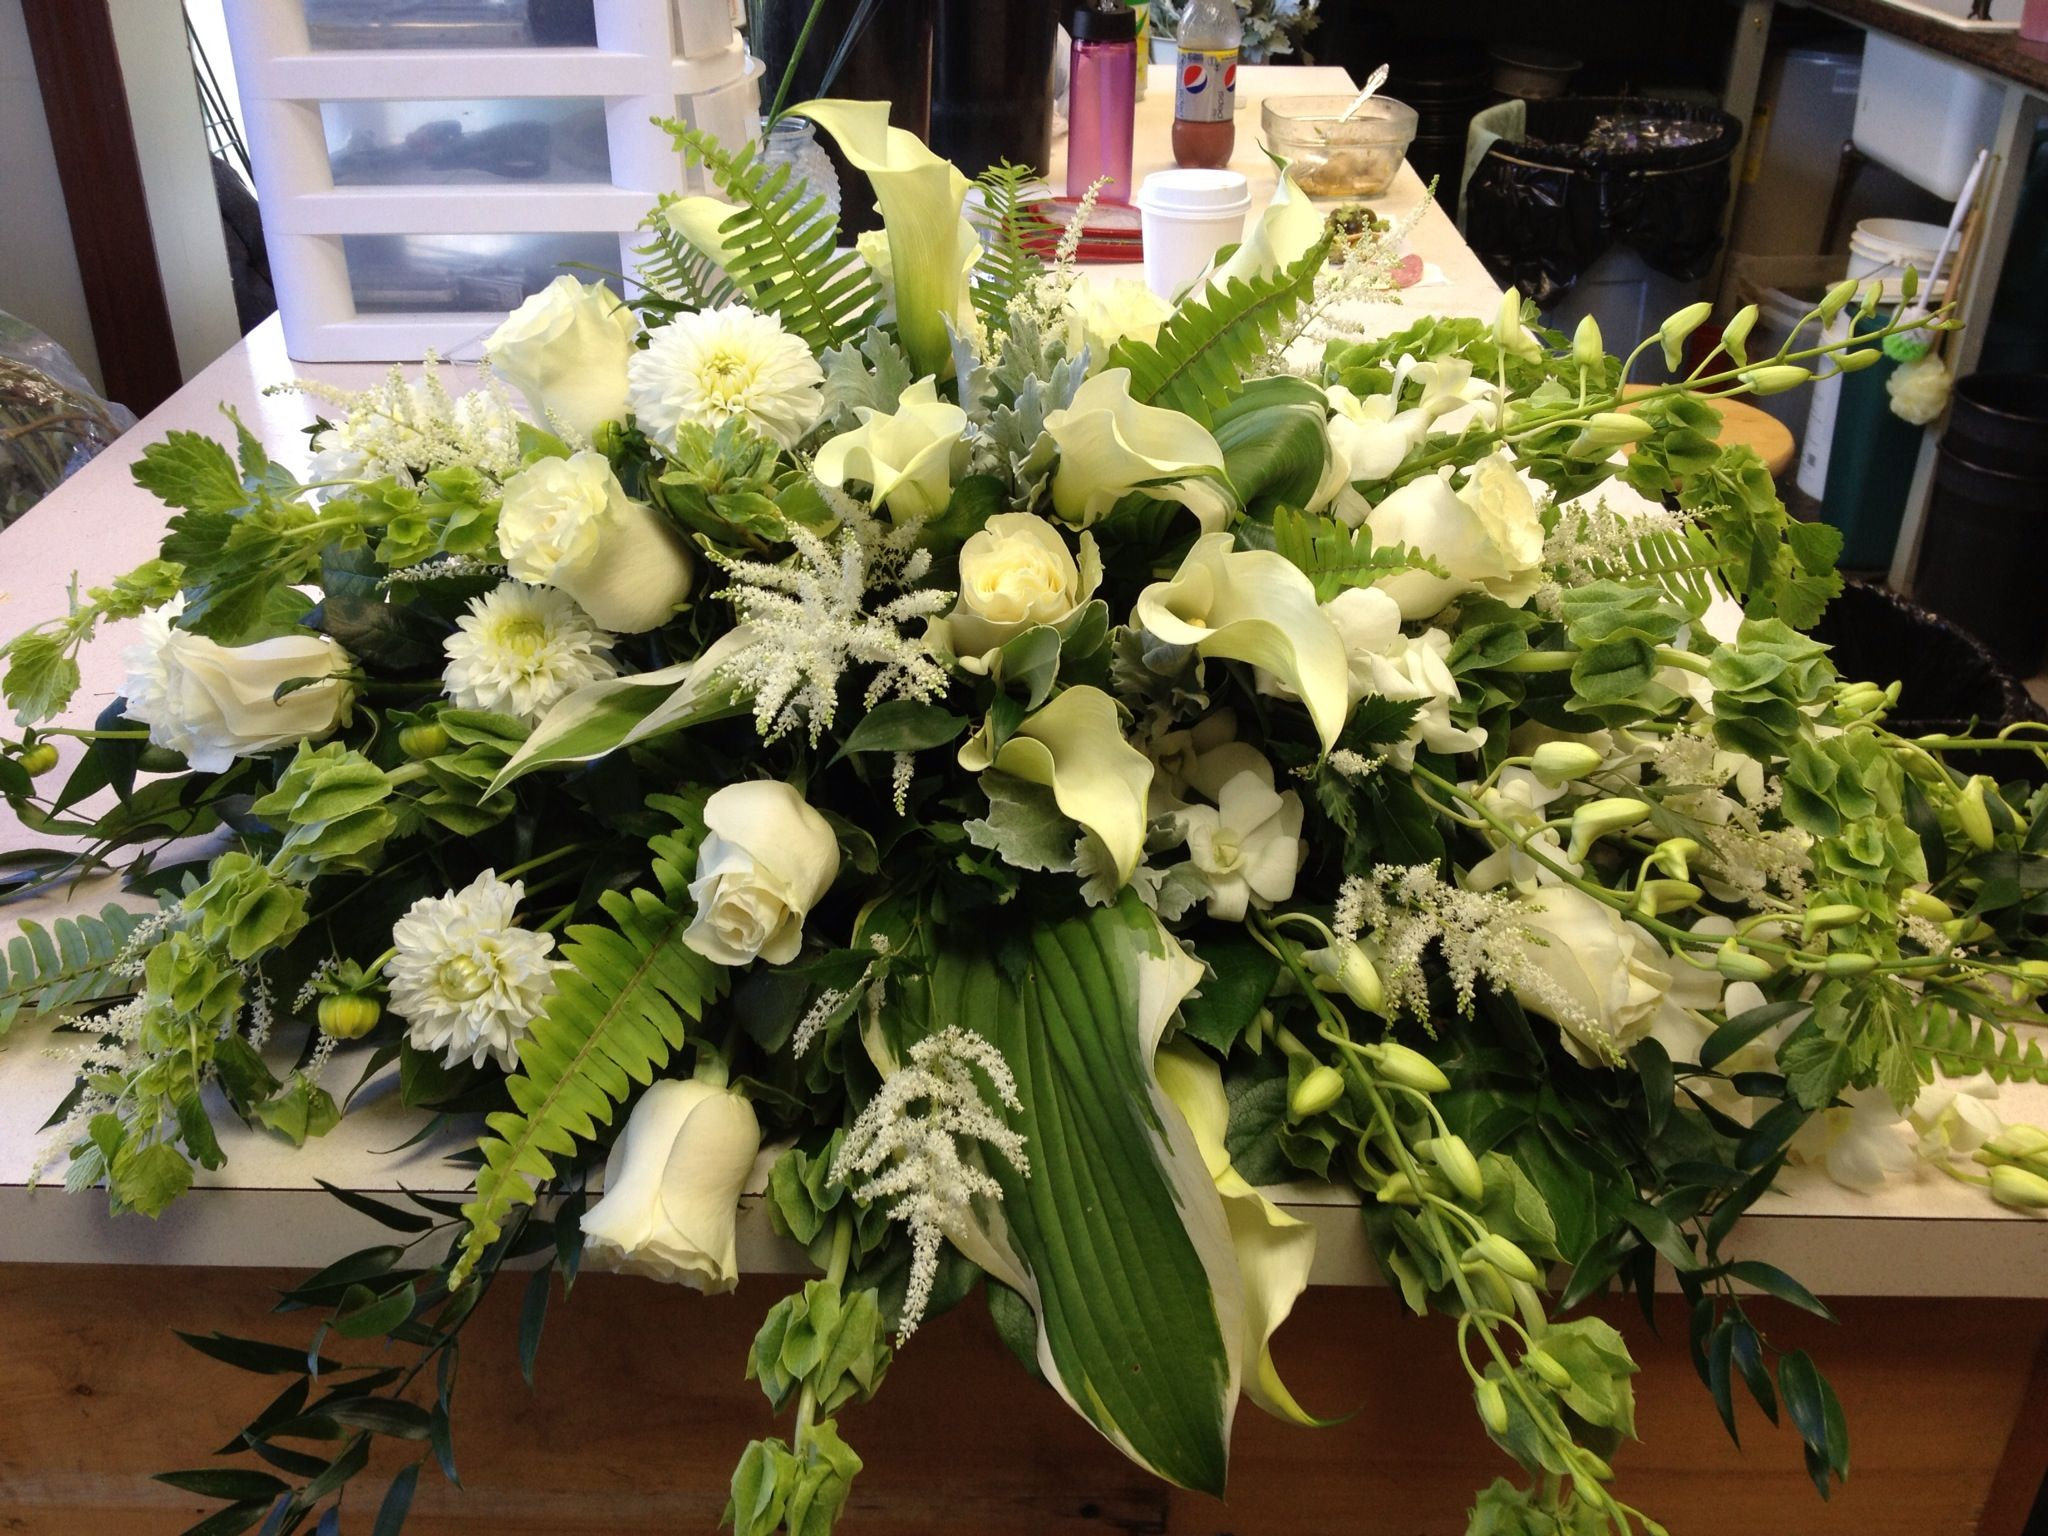 Simply Elegant White Casket Spray Funeral Flower Arrangements Funeral Arrangements Casket Flowers